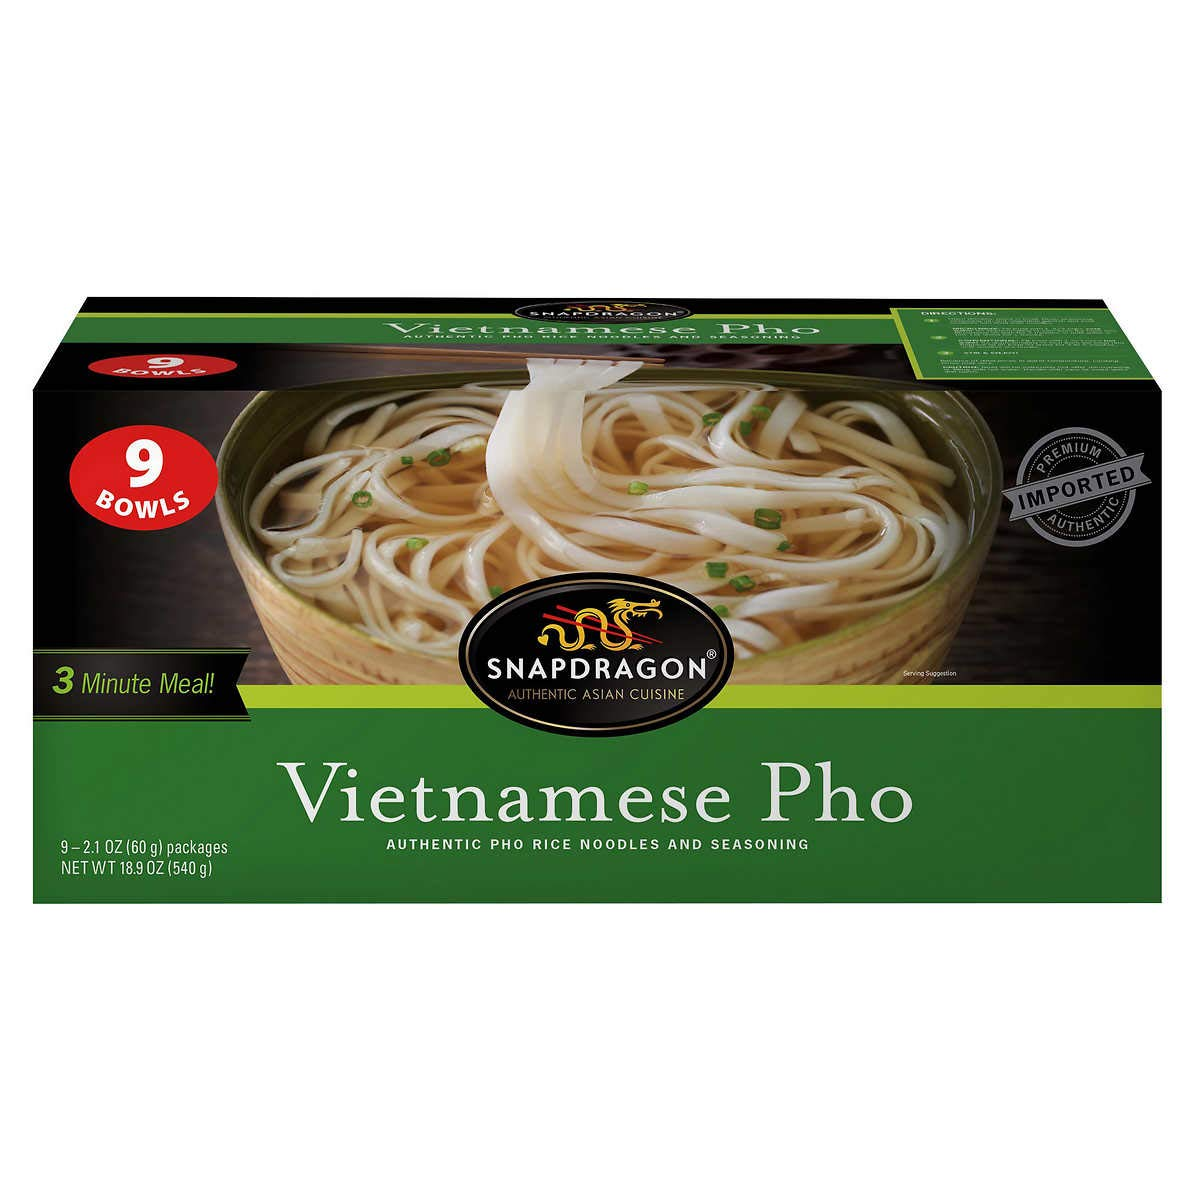 Snapdragon Vietnamese Pho Bowls, 2.1 Oz, 9Count,, 18.9 Oz ()